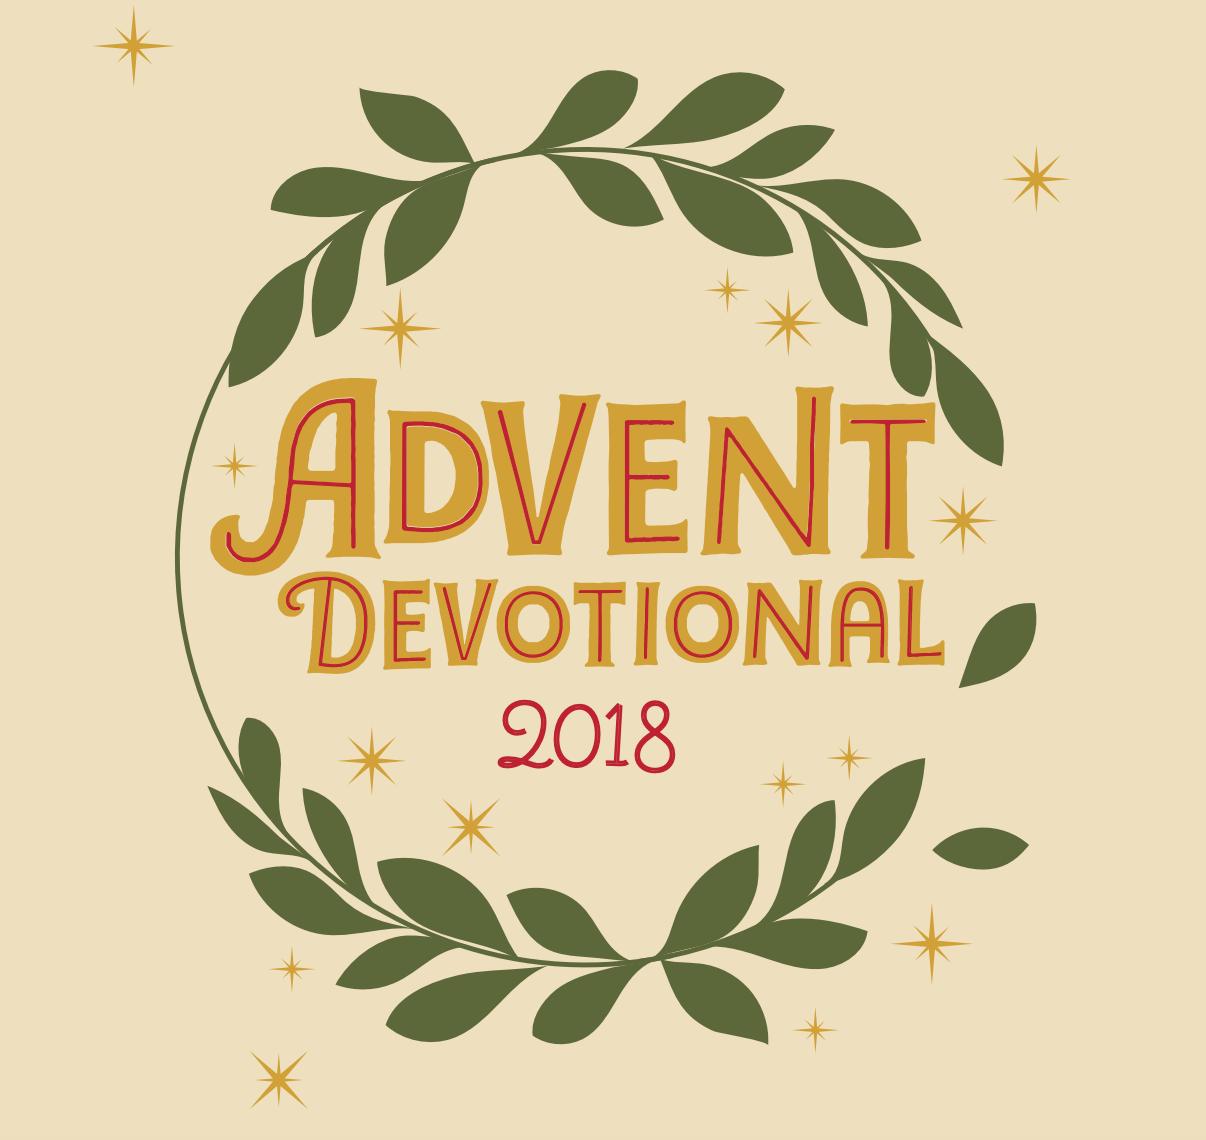 Advent devotional 2018